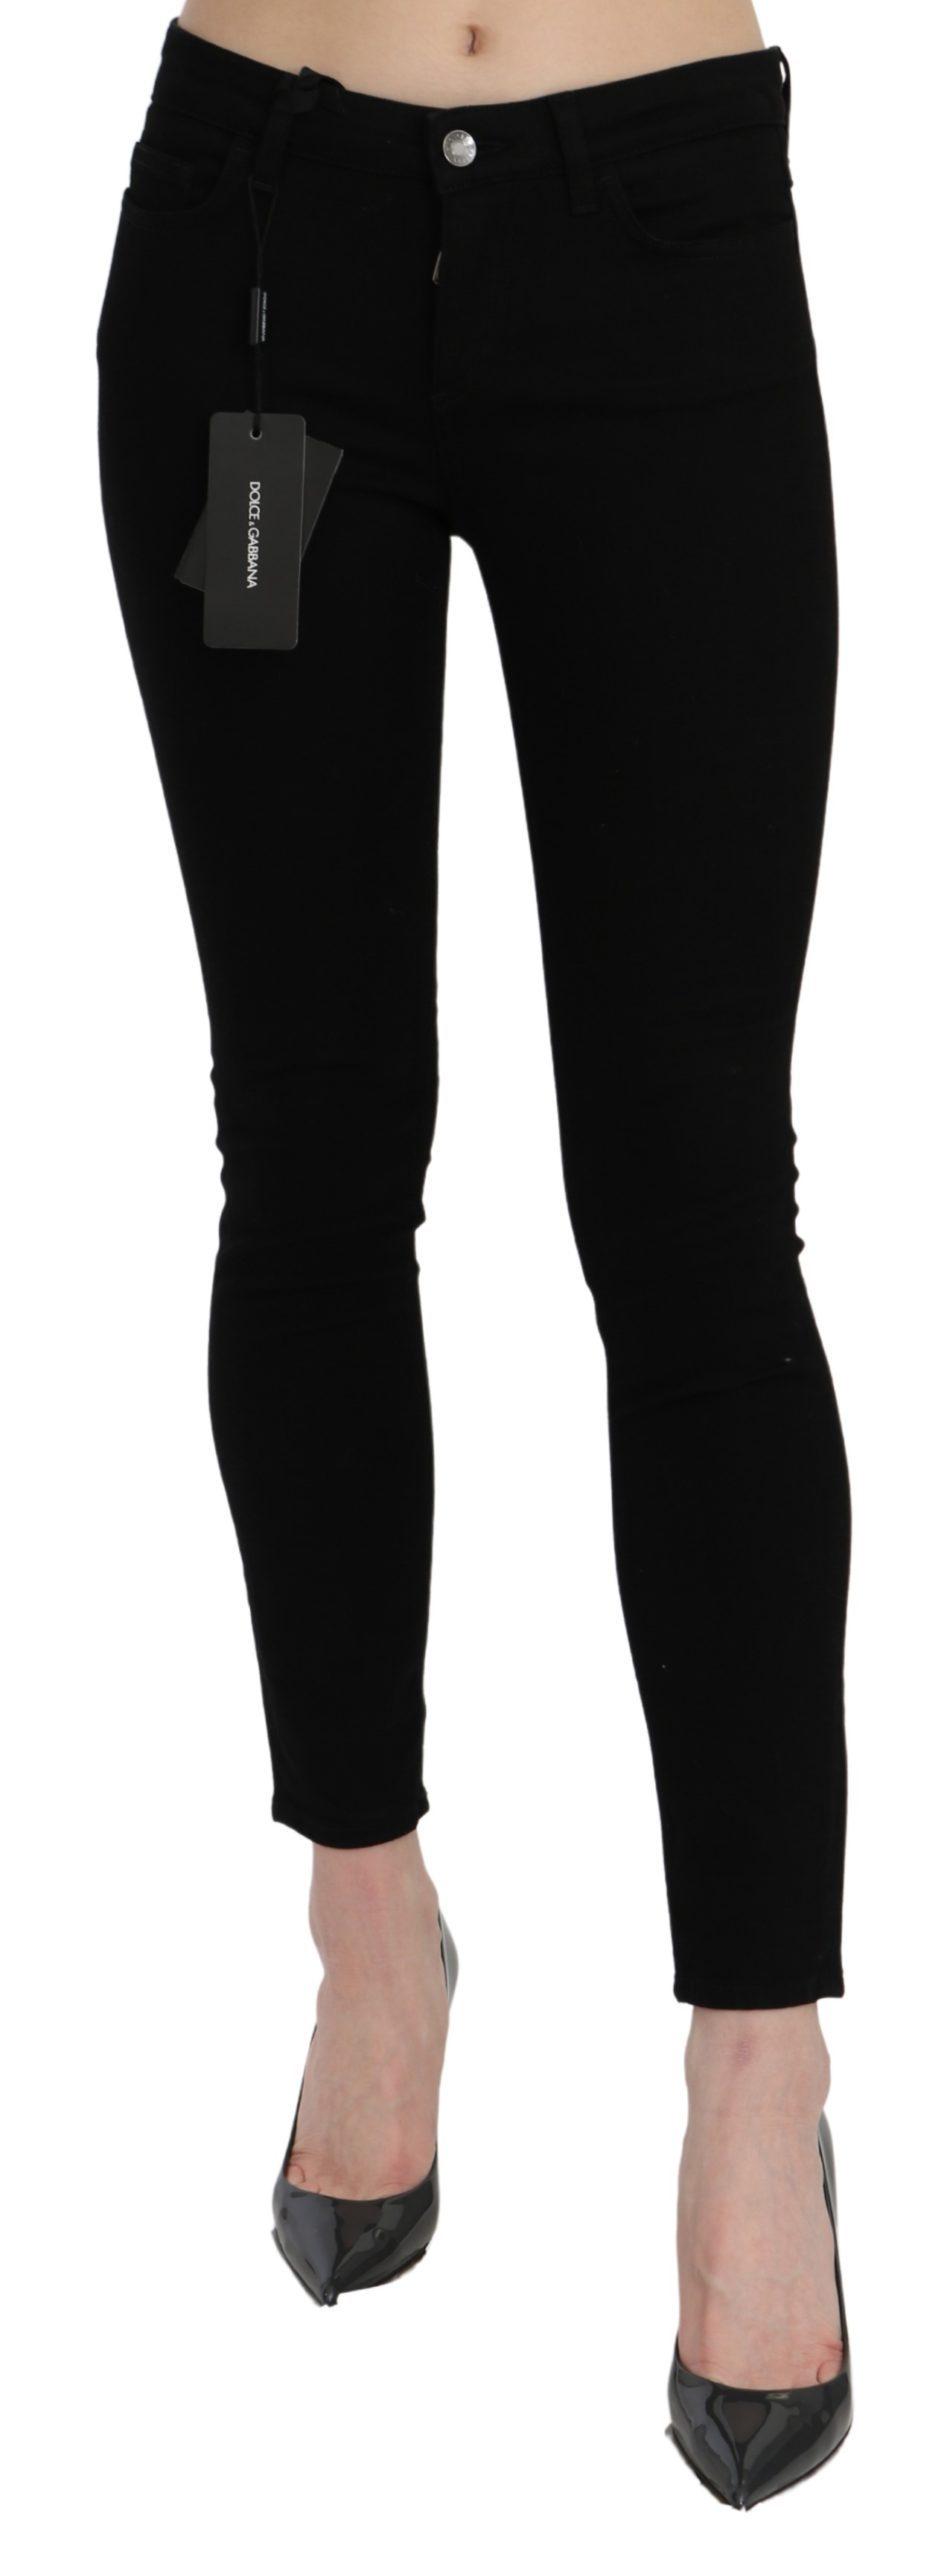 Dolce & Gabbana Women's Mid Waist Skinny Cotton Jeans Black PAN71074 - IT38 | XS